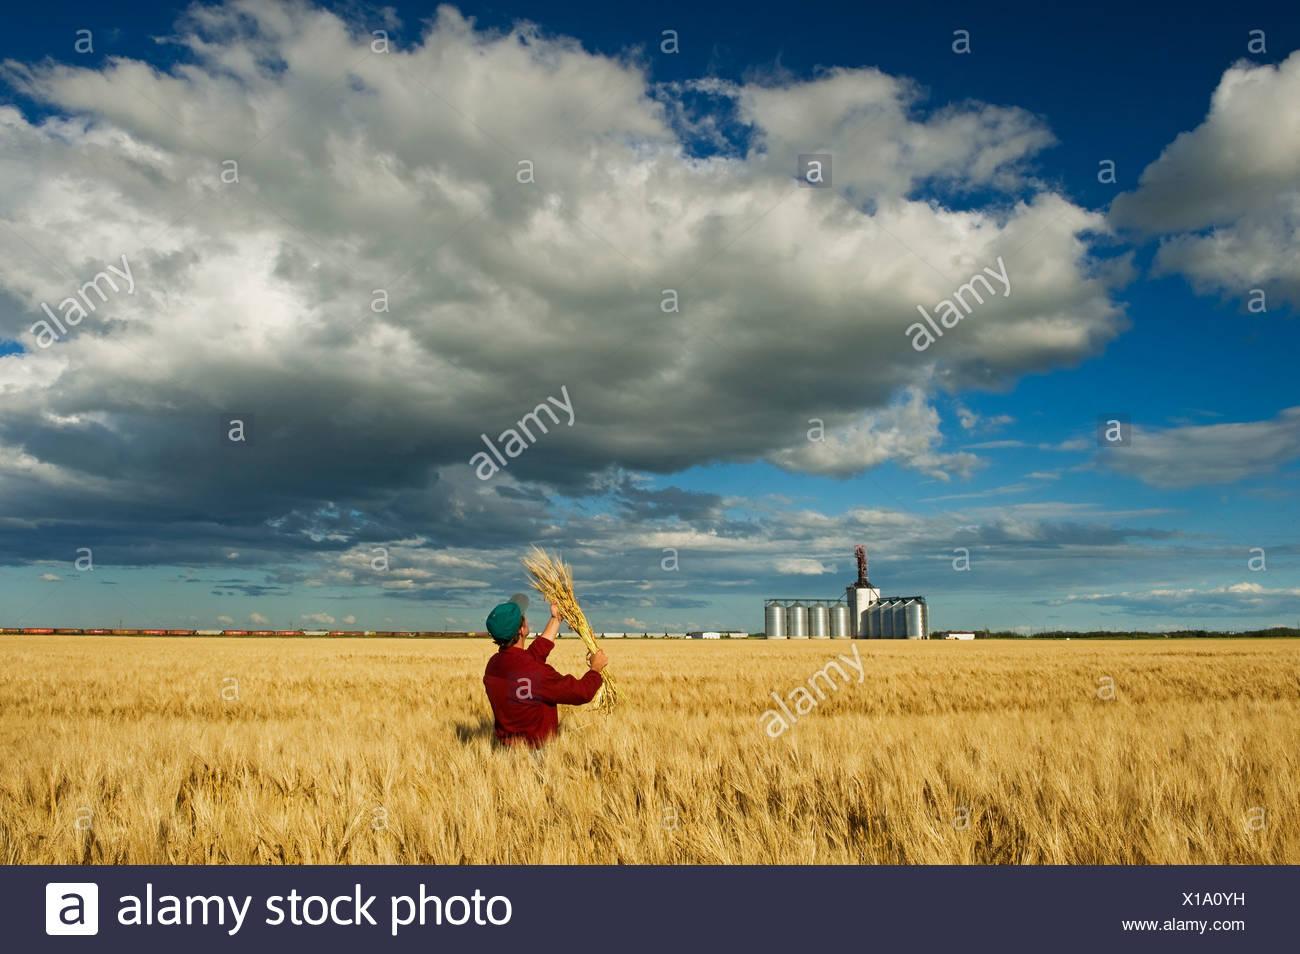 Man looks mature barley with an inland grain terminal and developing cumulonimbus clouds in background near Winnipeg Manitoba Ca - Stock Image